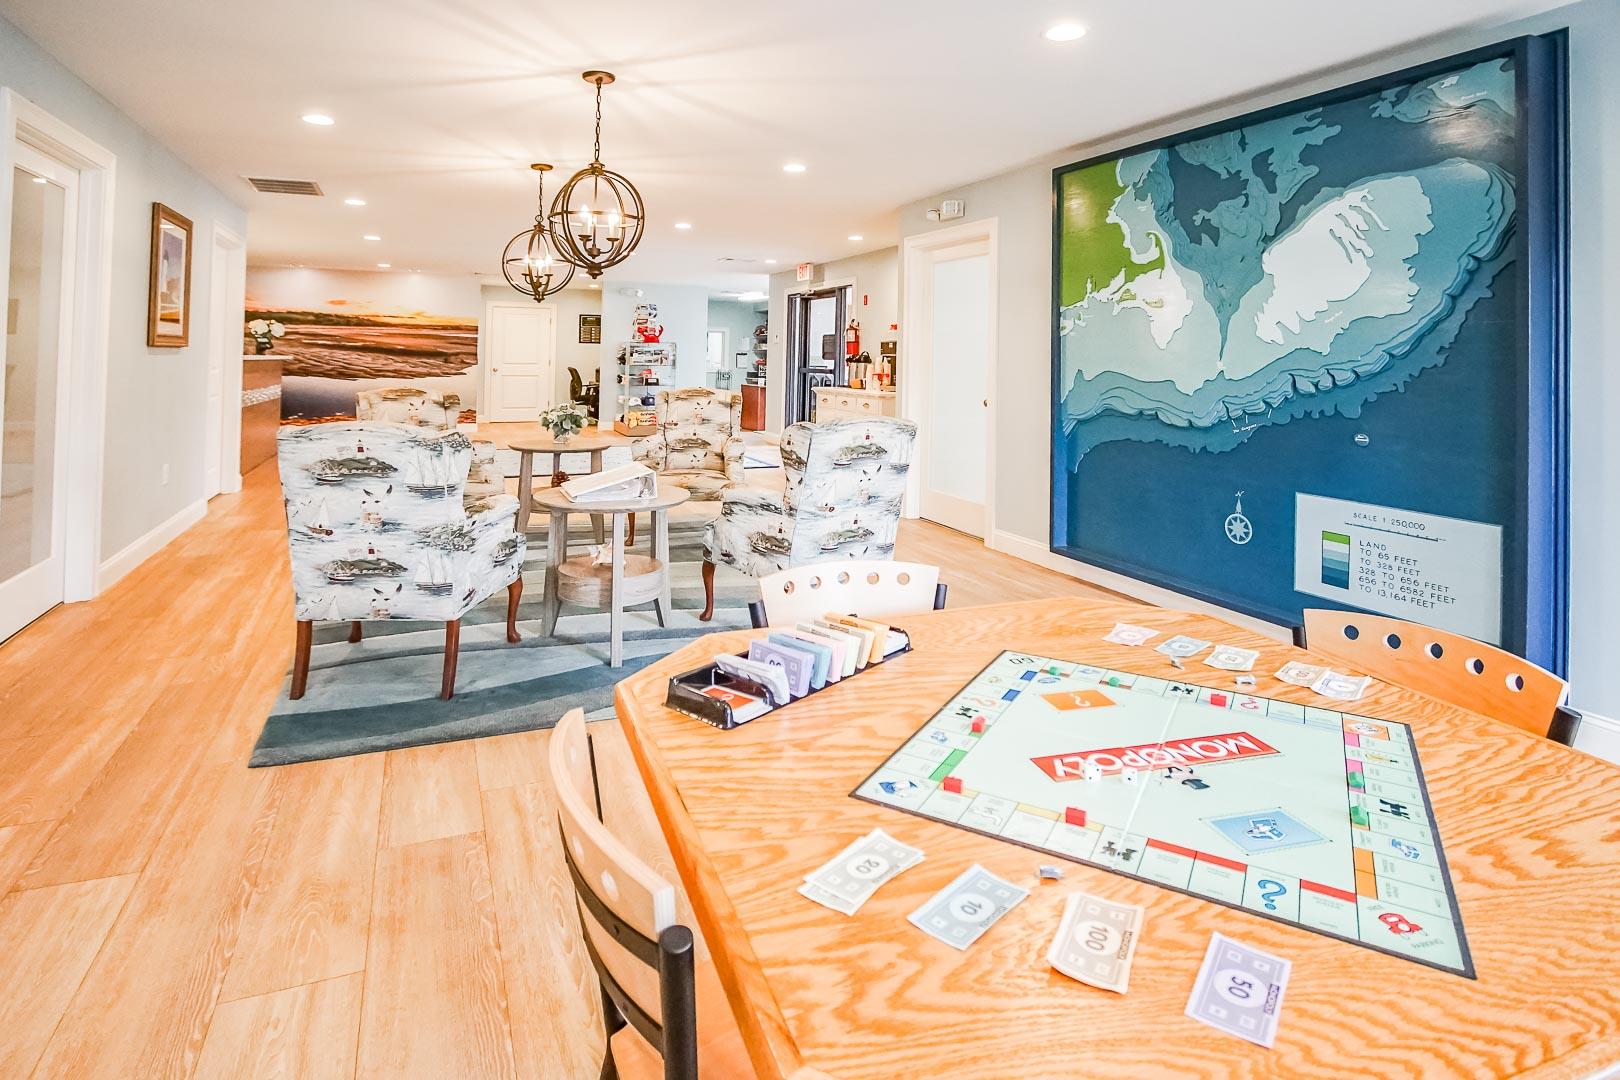 An entertaining lobby area at VRI's Brewster Green Resort in Massachusetts.